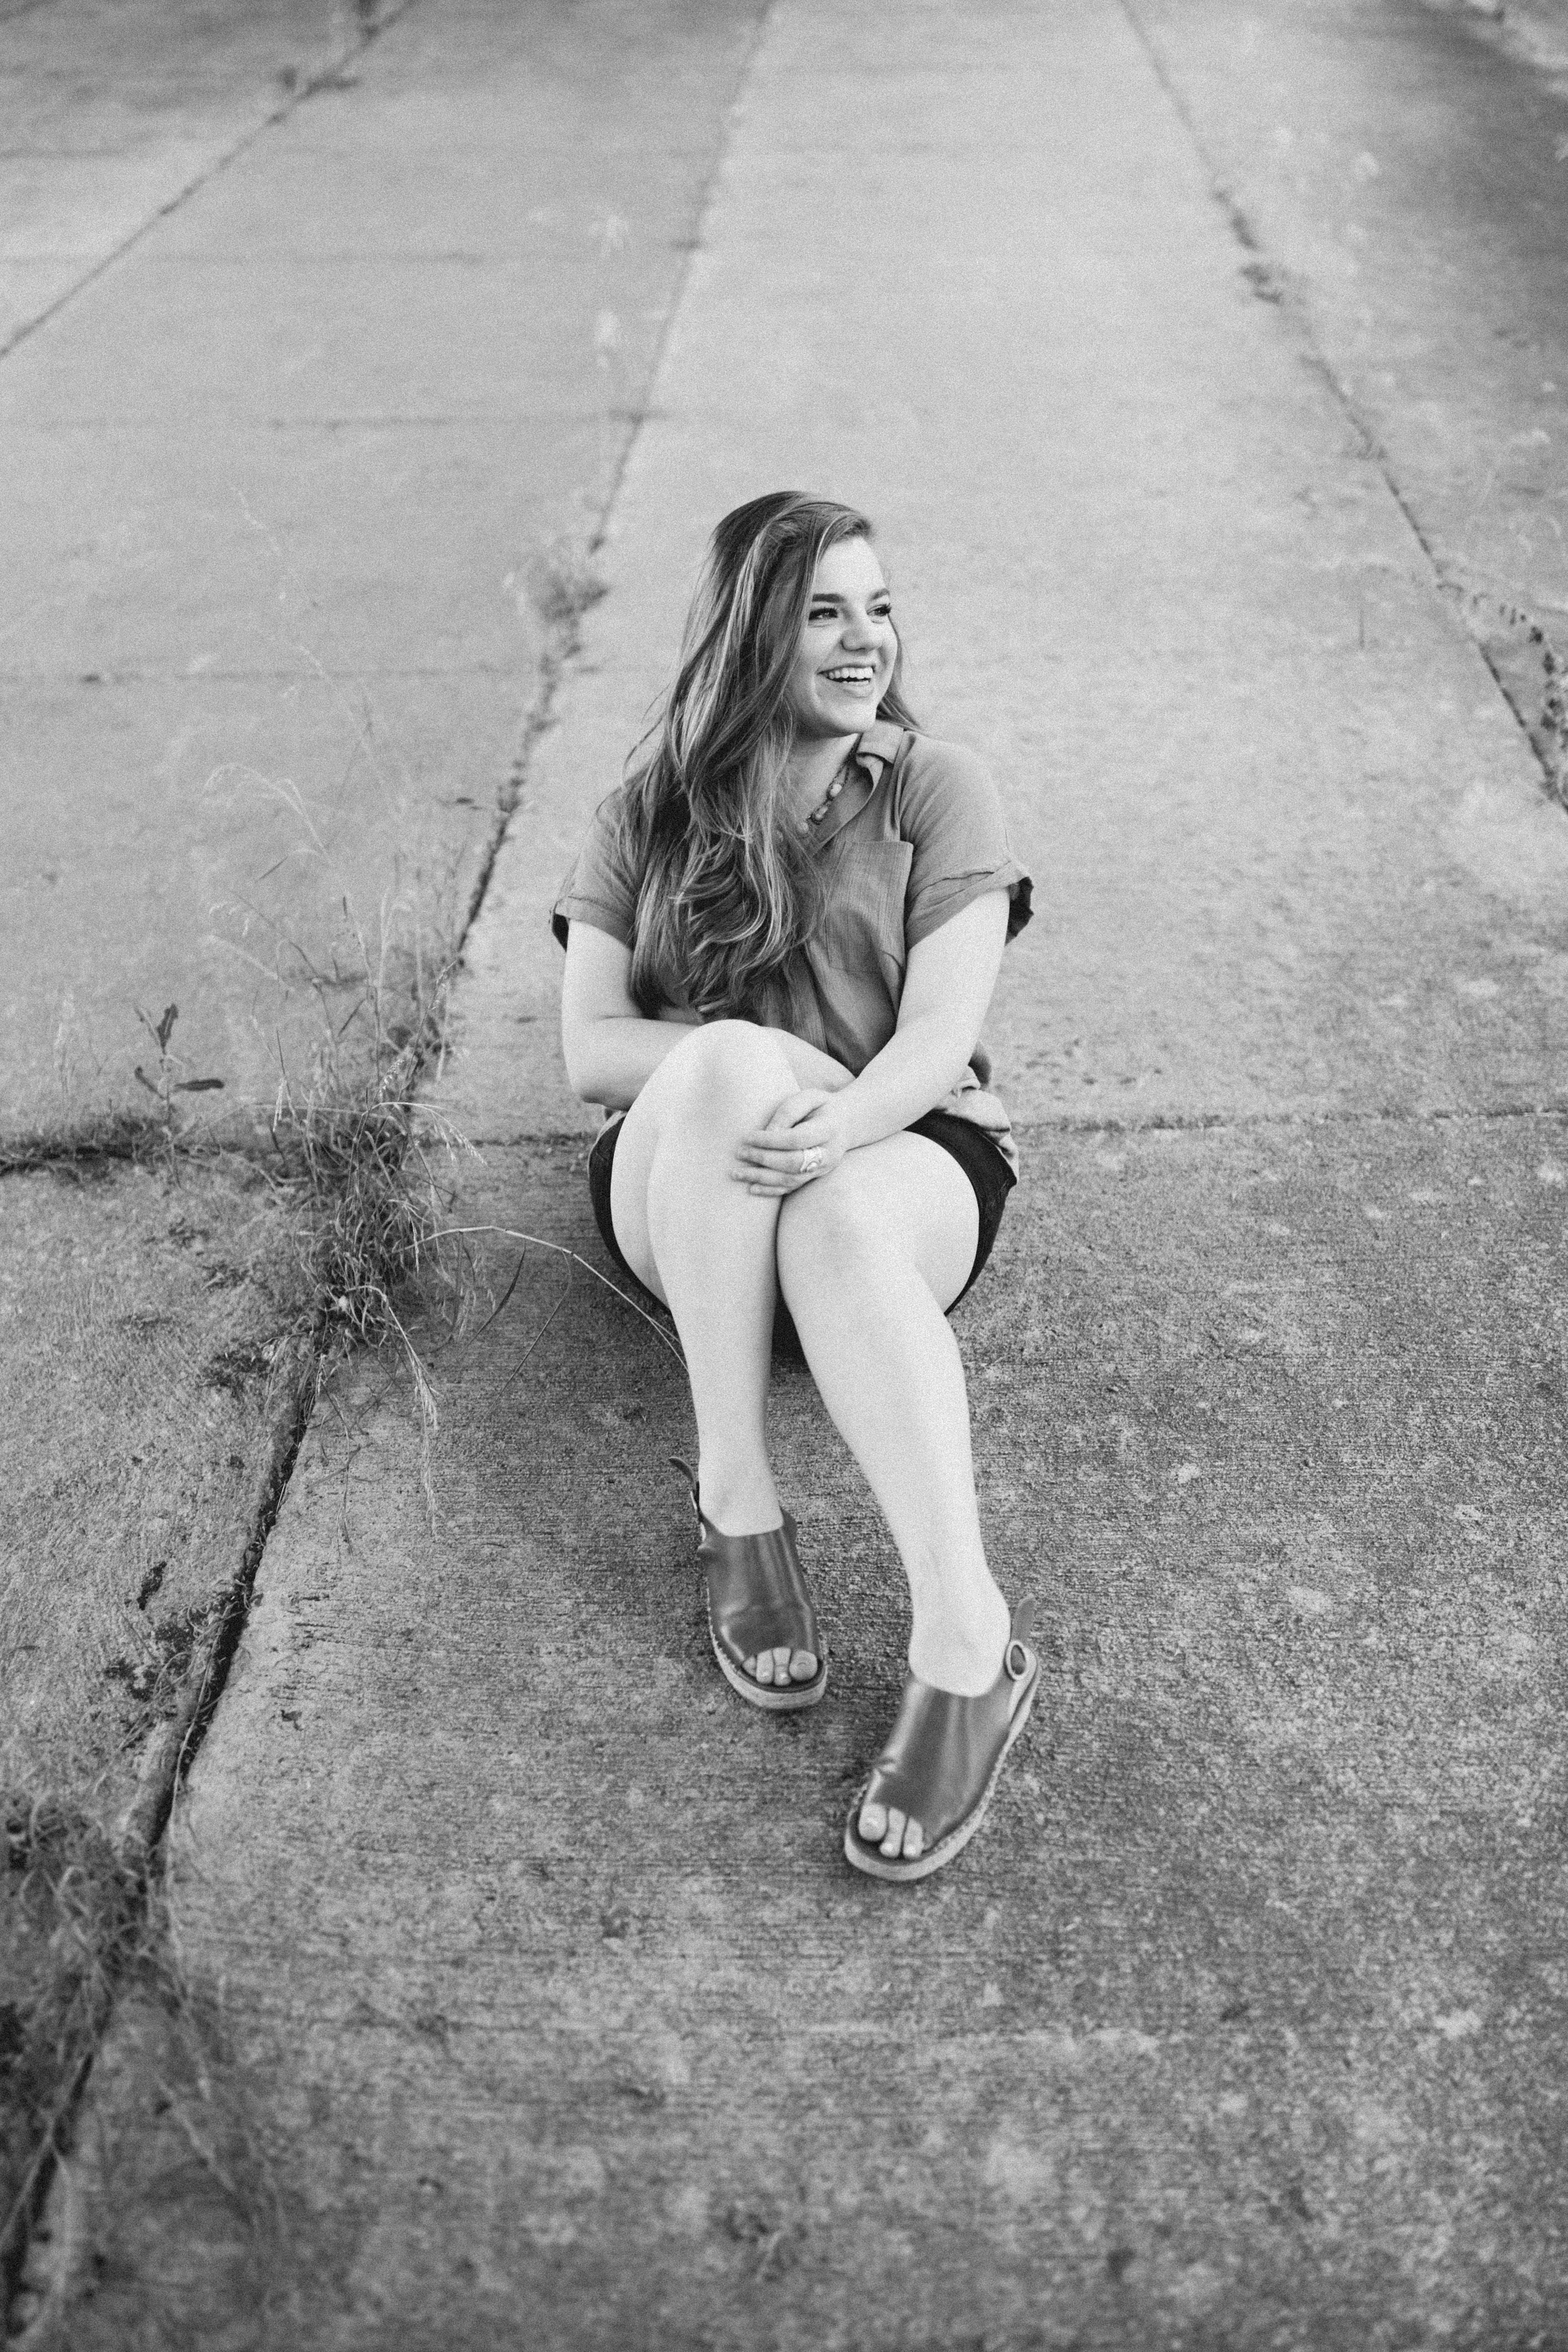 grayscale photo of sitting woman